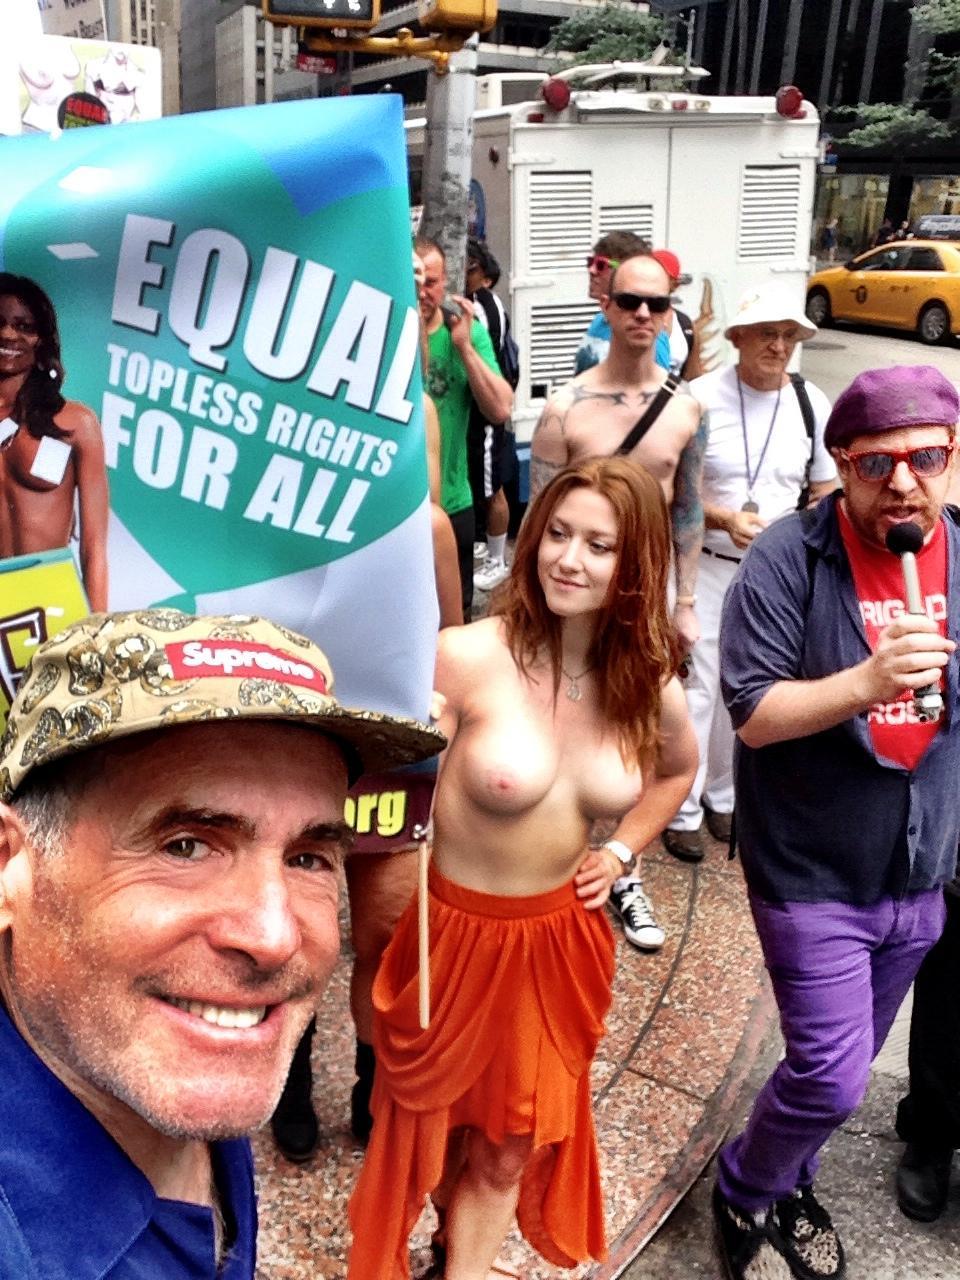 Girl topless public new york